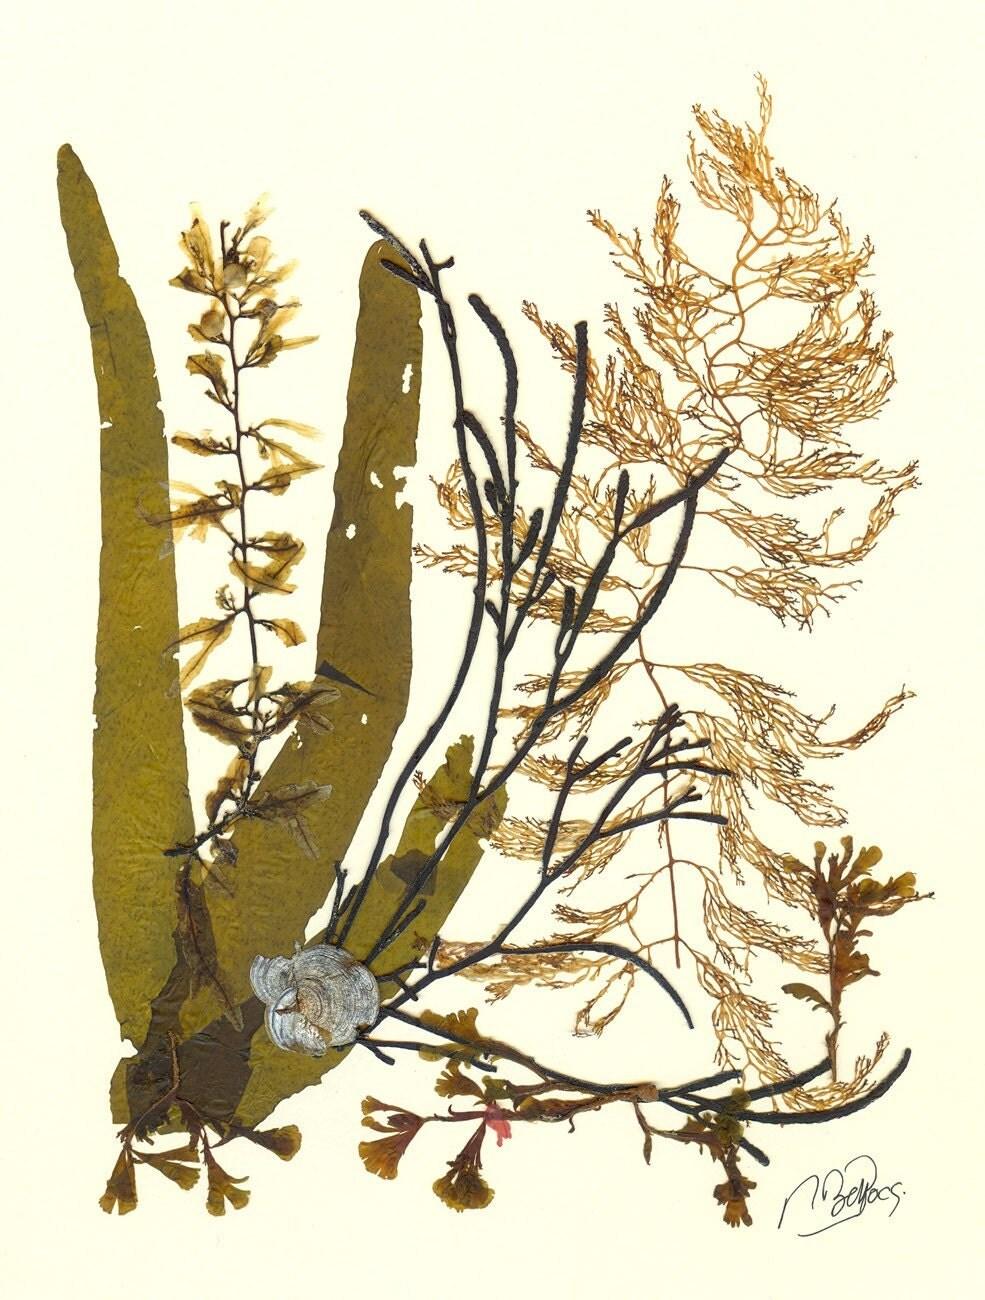 Original natural seaweed artwork MADE TO ORDER  Original brown Algae Collage 13246 Marine Botanical Seaweed Art - AlgaNet